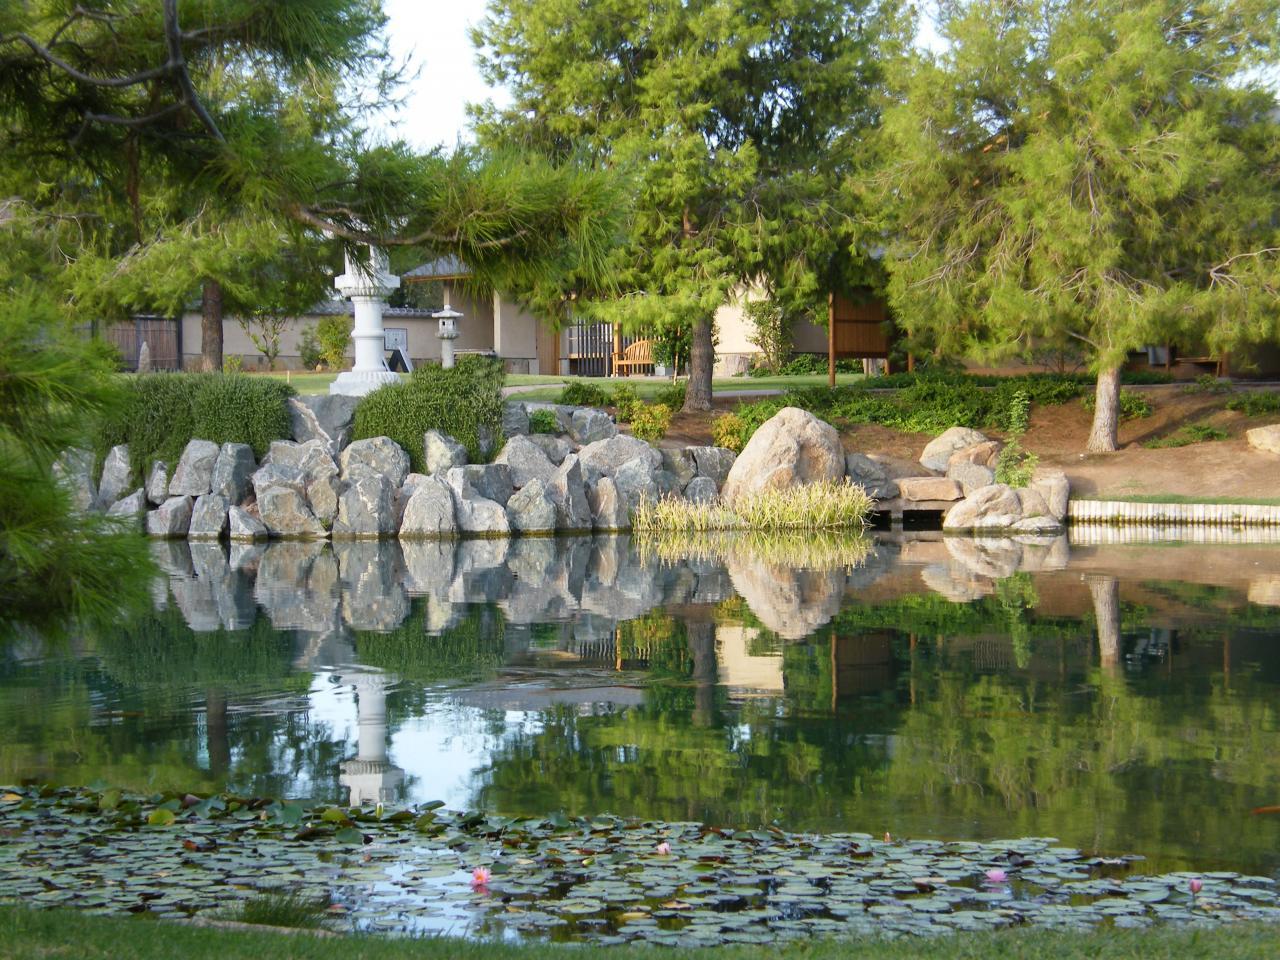 Cultural Arts Coalition 39 S Japanese Friendship Garden In Phoenix Arizona Sept 21 2010